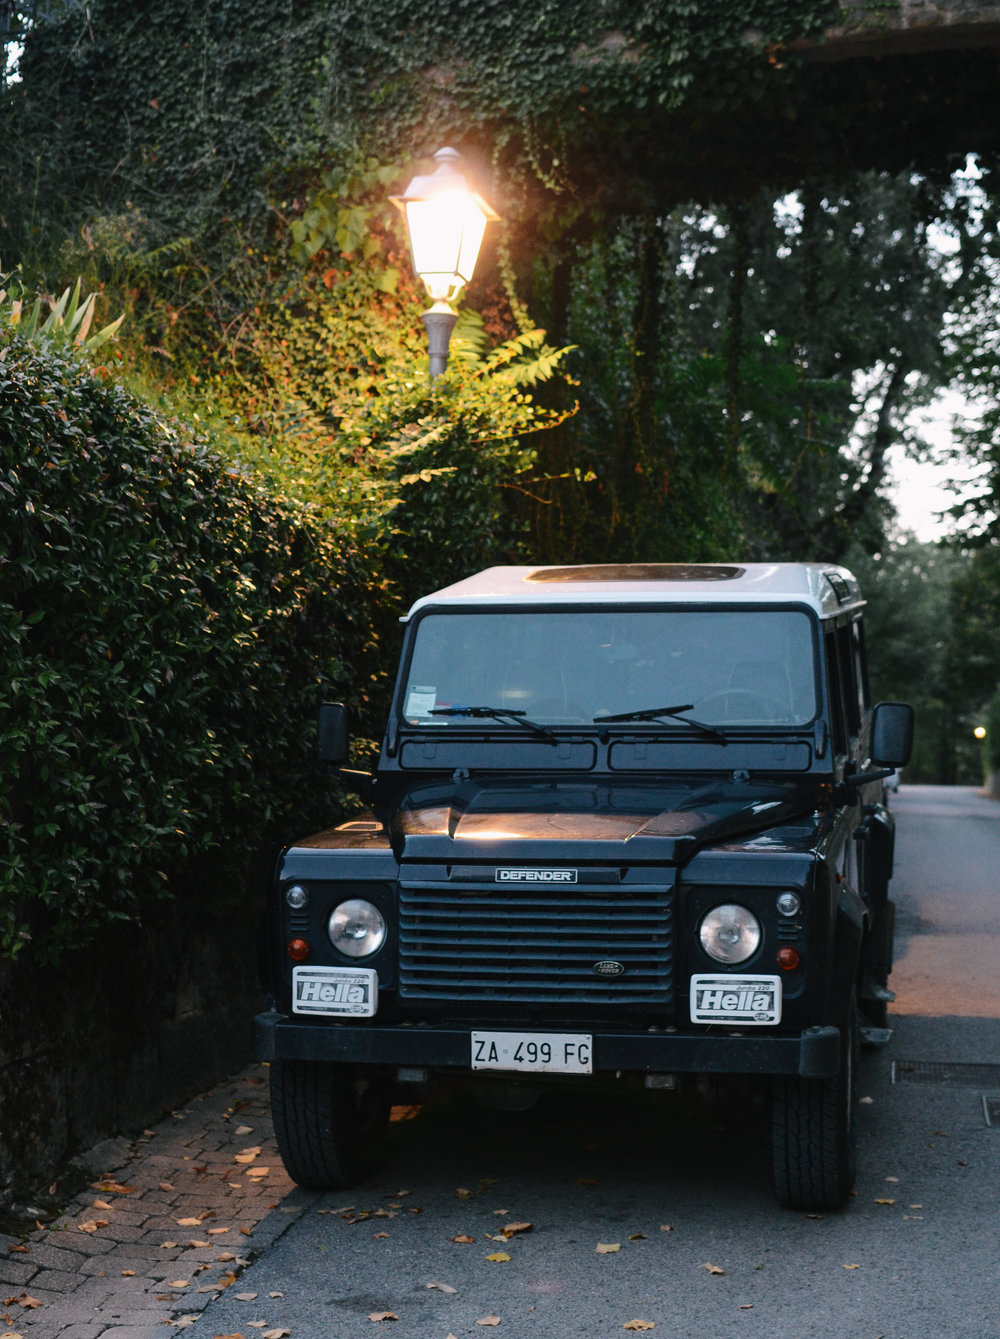 florence-italy-travel-guide-adventure-blog_DSC_0857.jpg